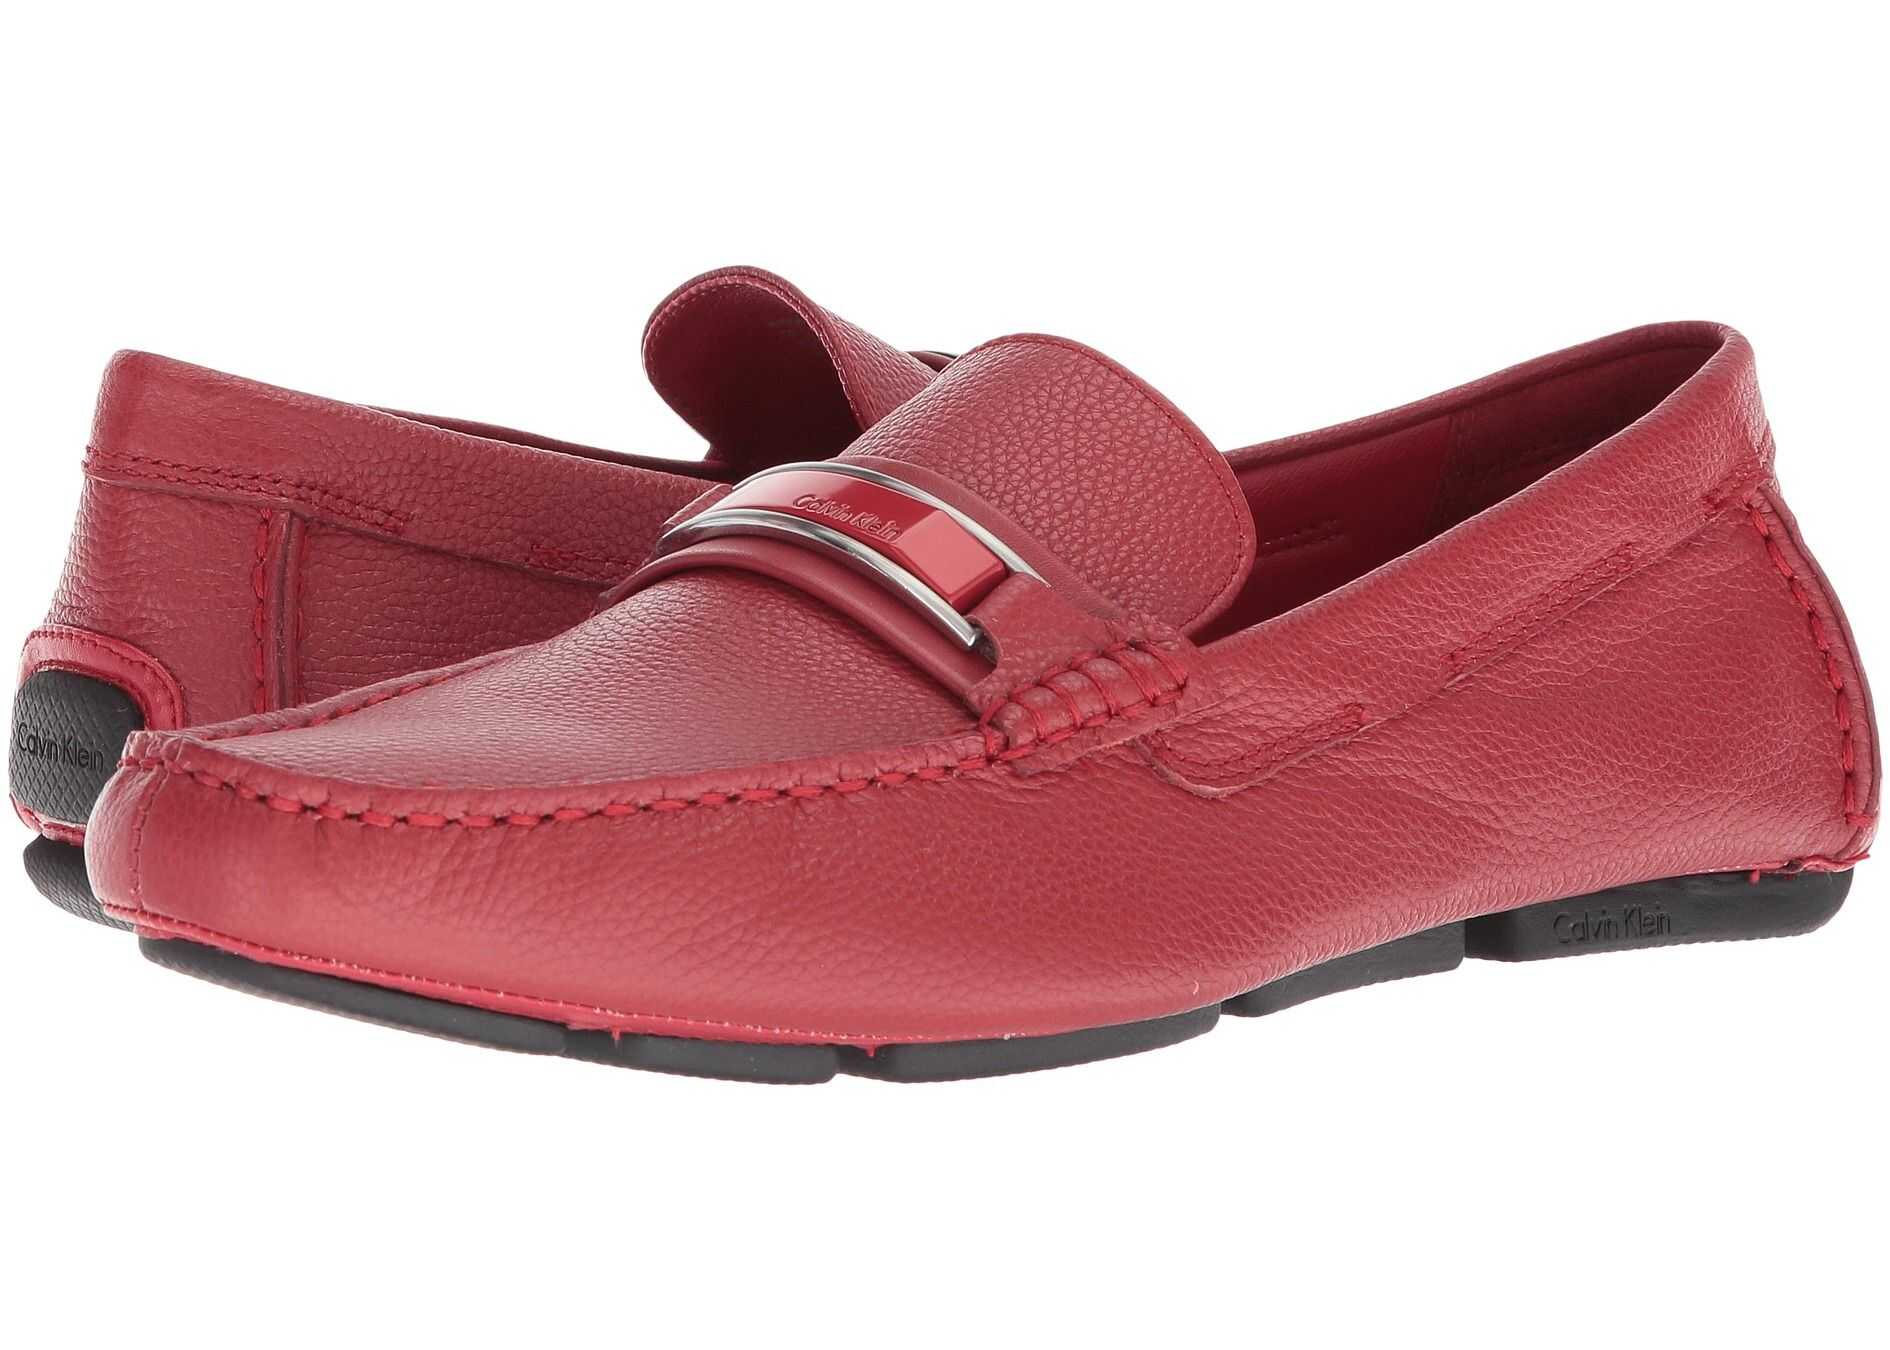 Calvin Klein Madsen Brick Red Embossed Tumbled